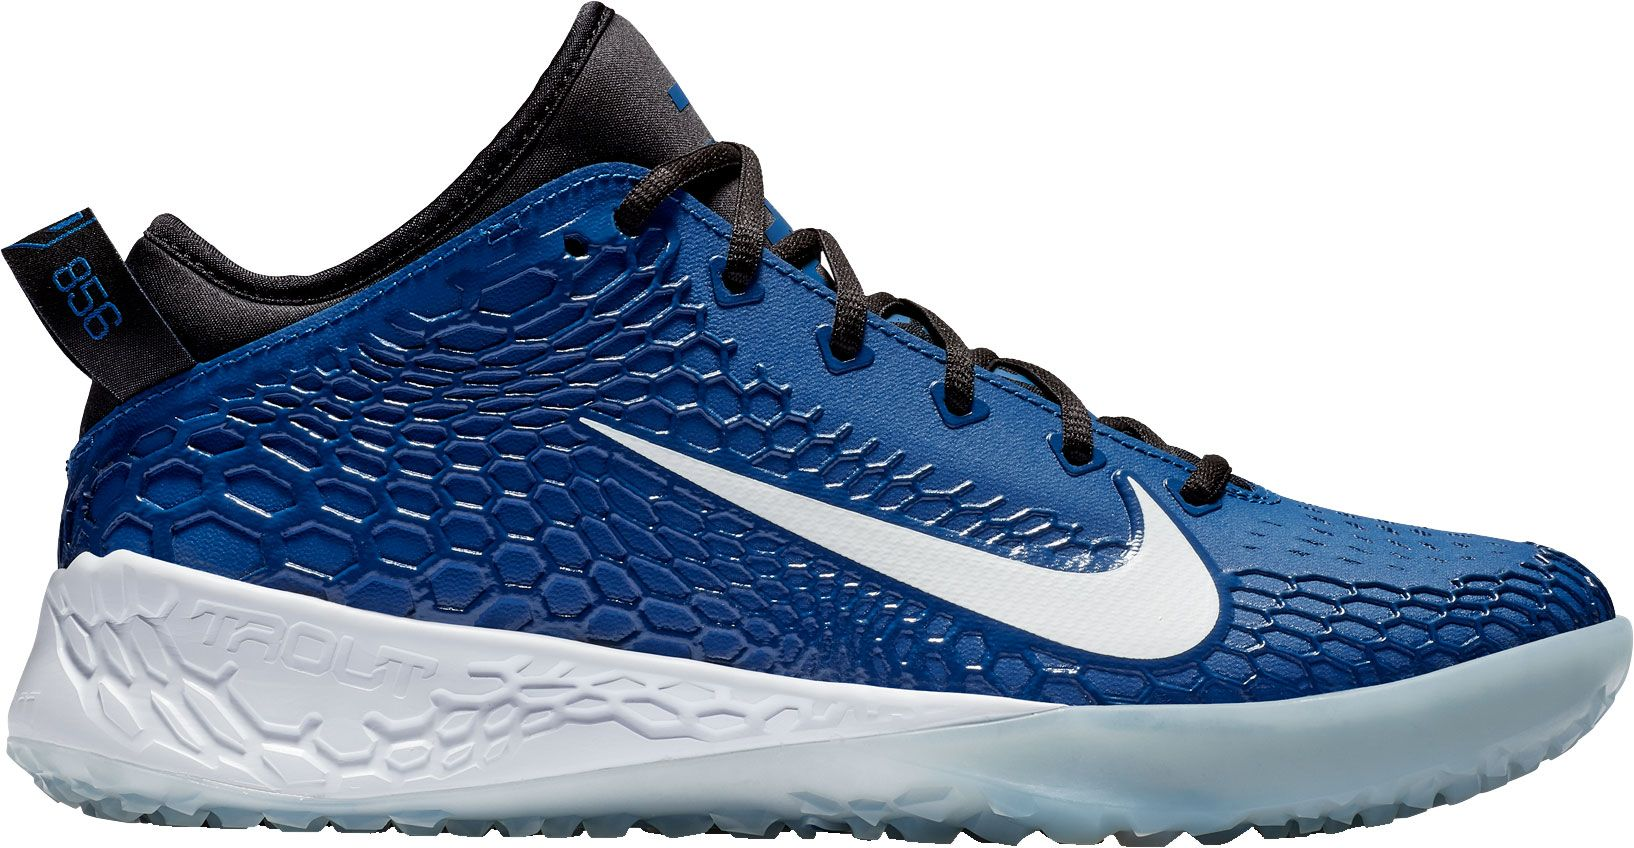 Nike Men's Force Zoom Trout 5 Turf